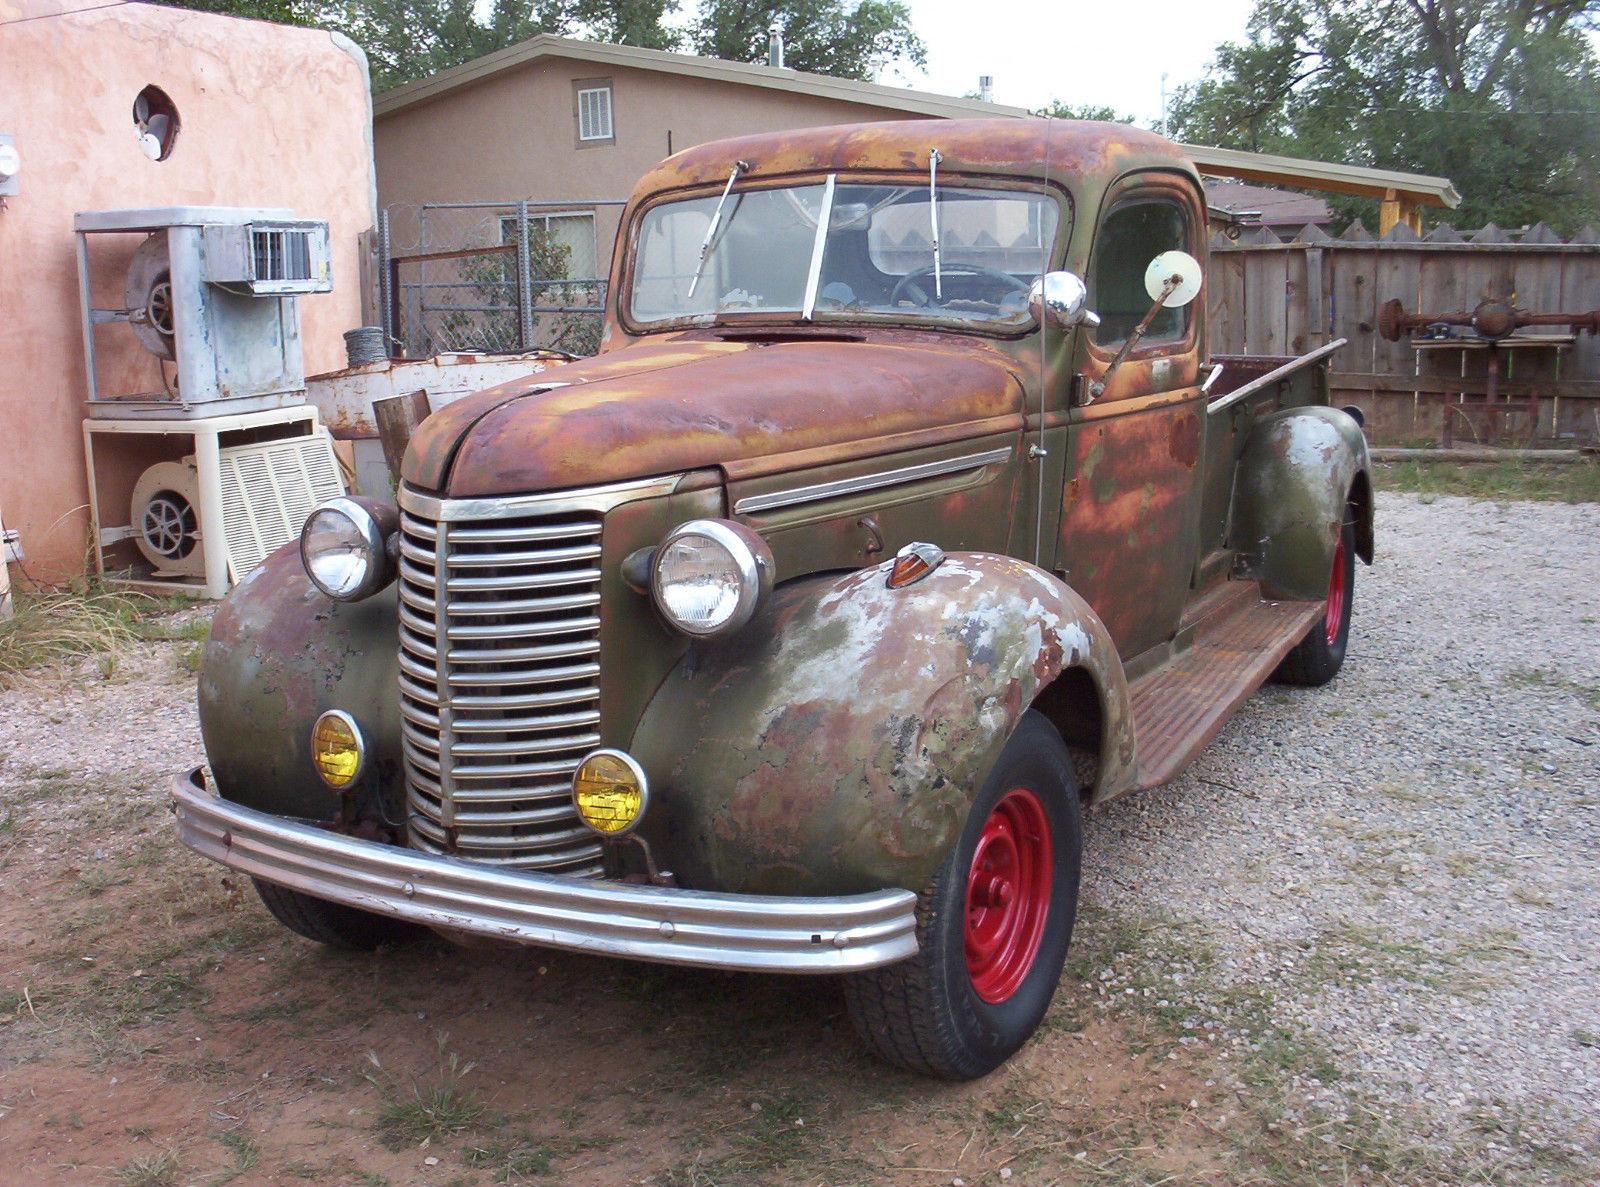 Hot Rod Barn : Chevy pickup rat rod hot barn find patina